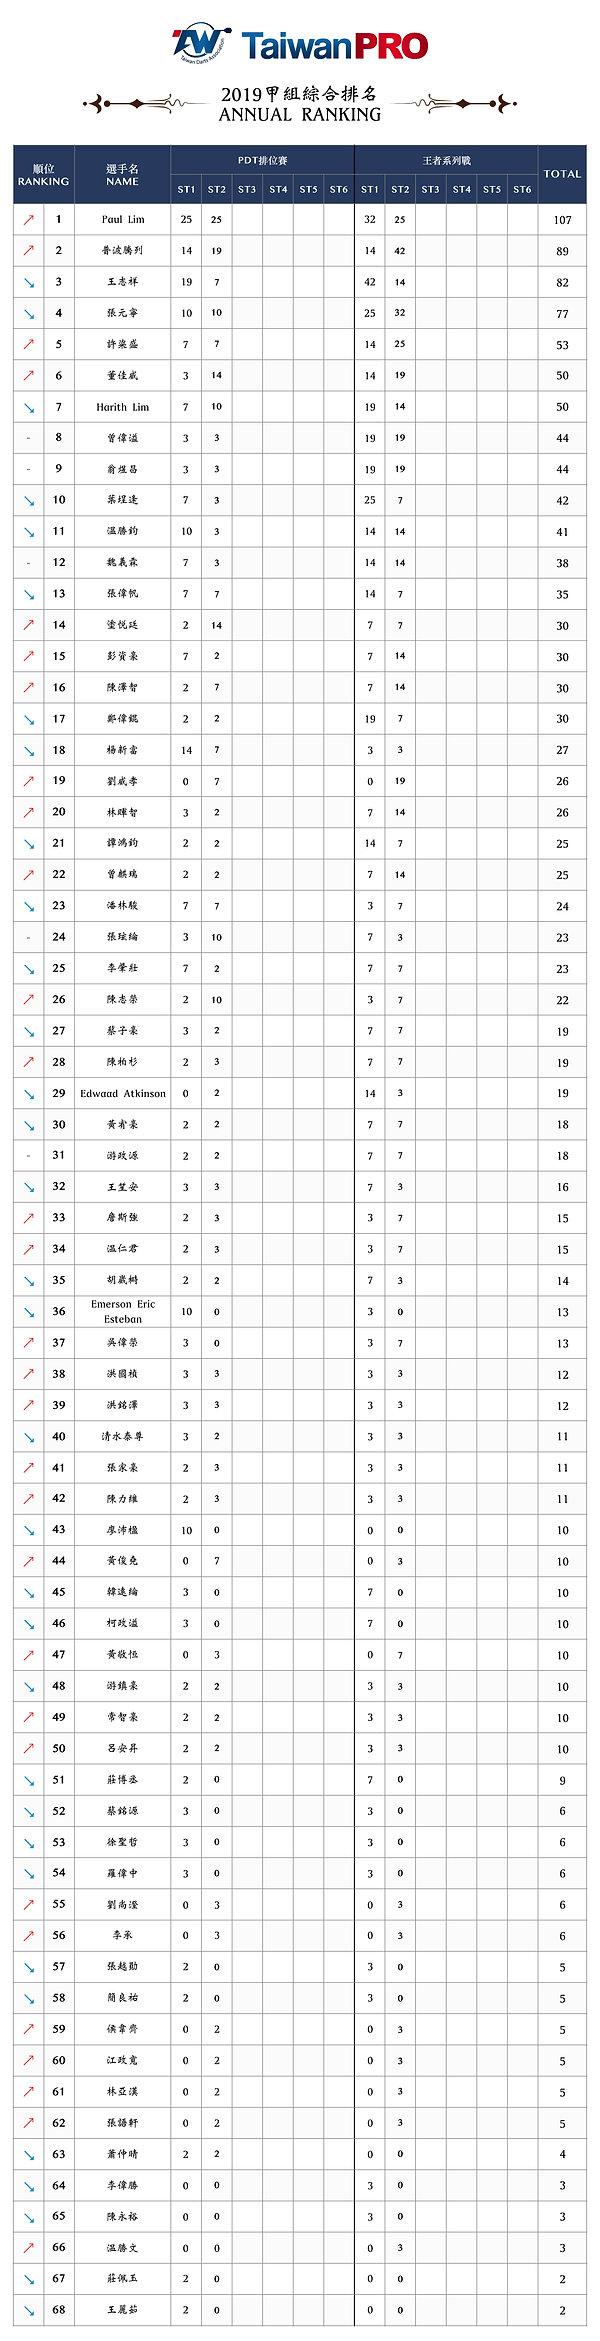 TaiwanPRO-年度排名-0604.jpg